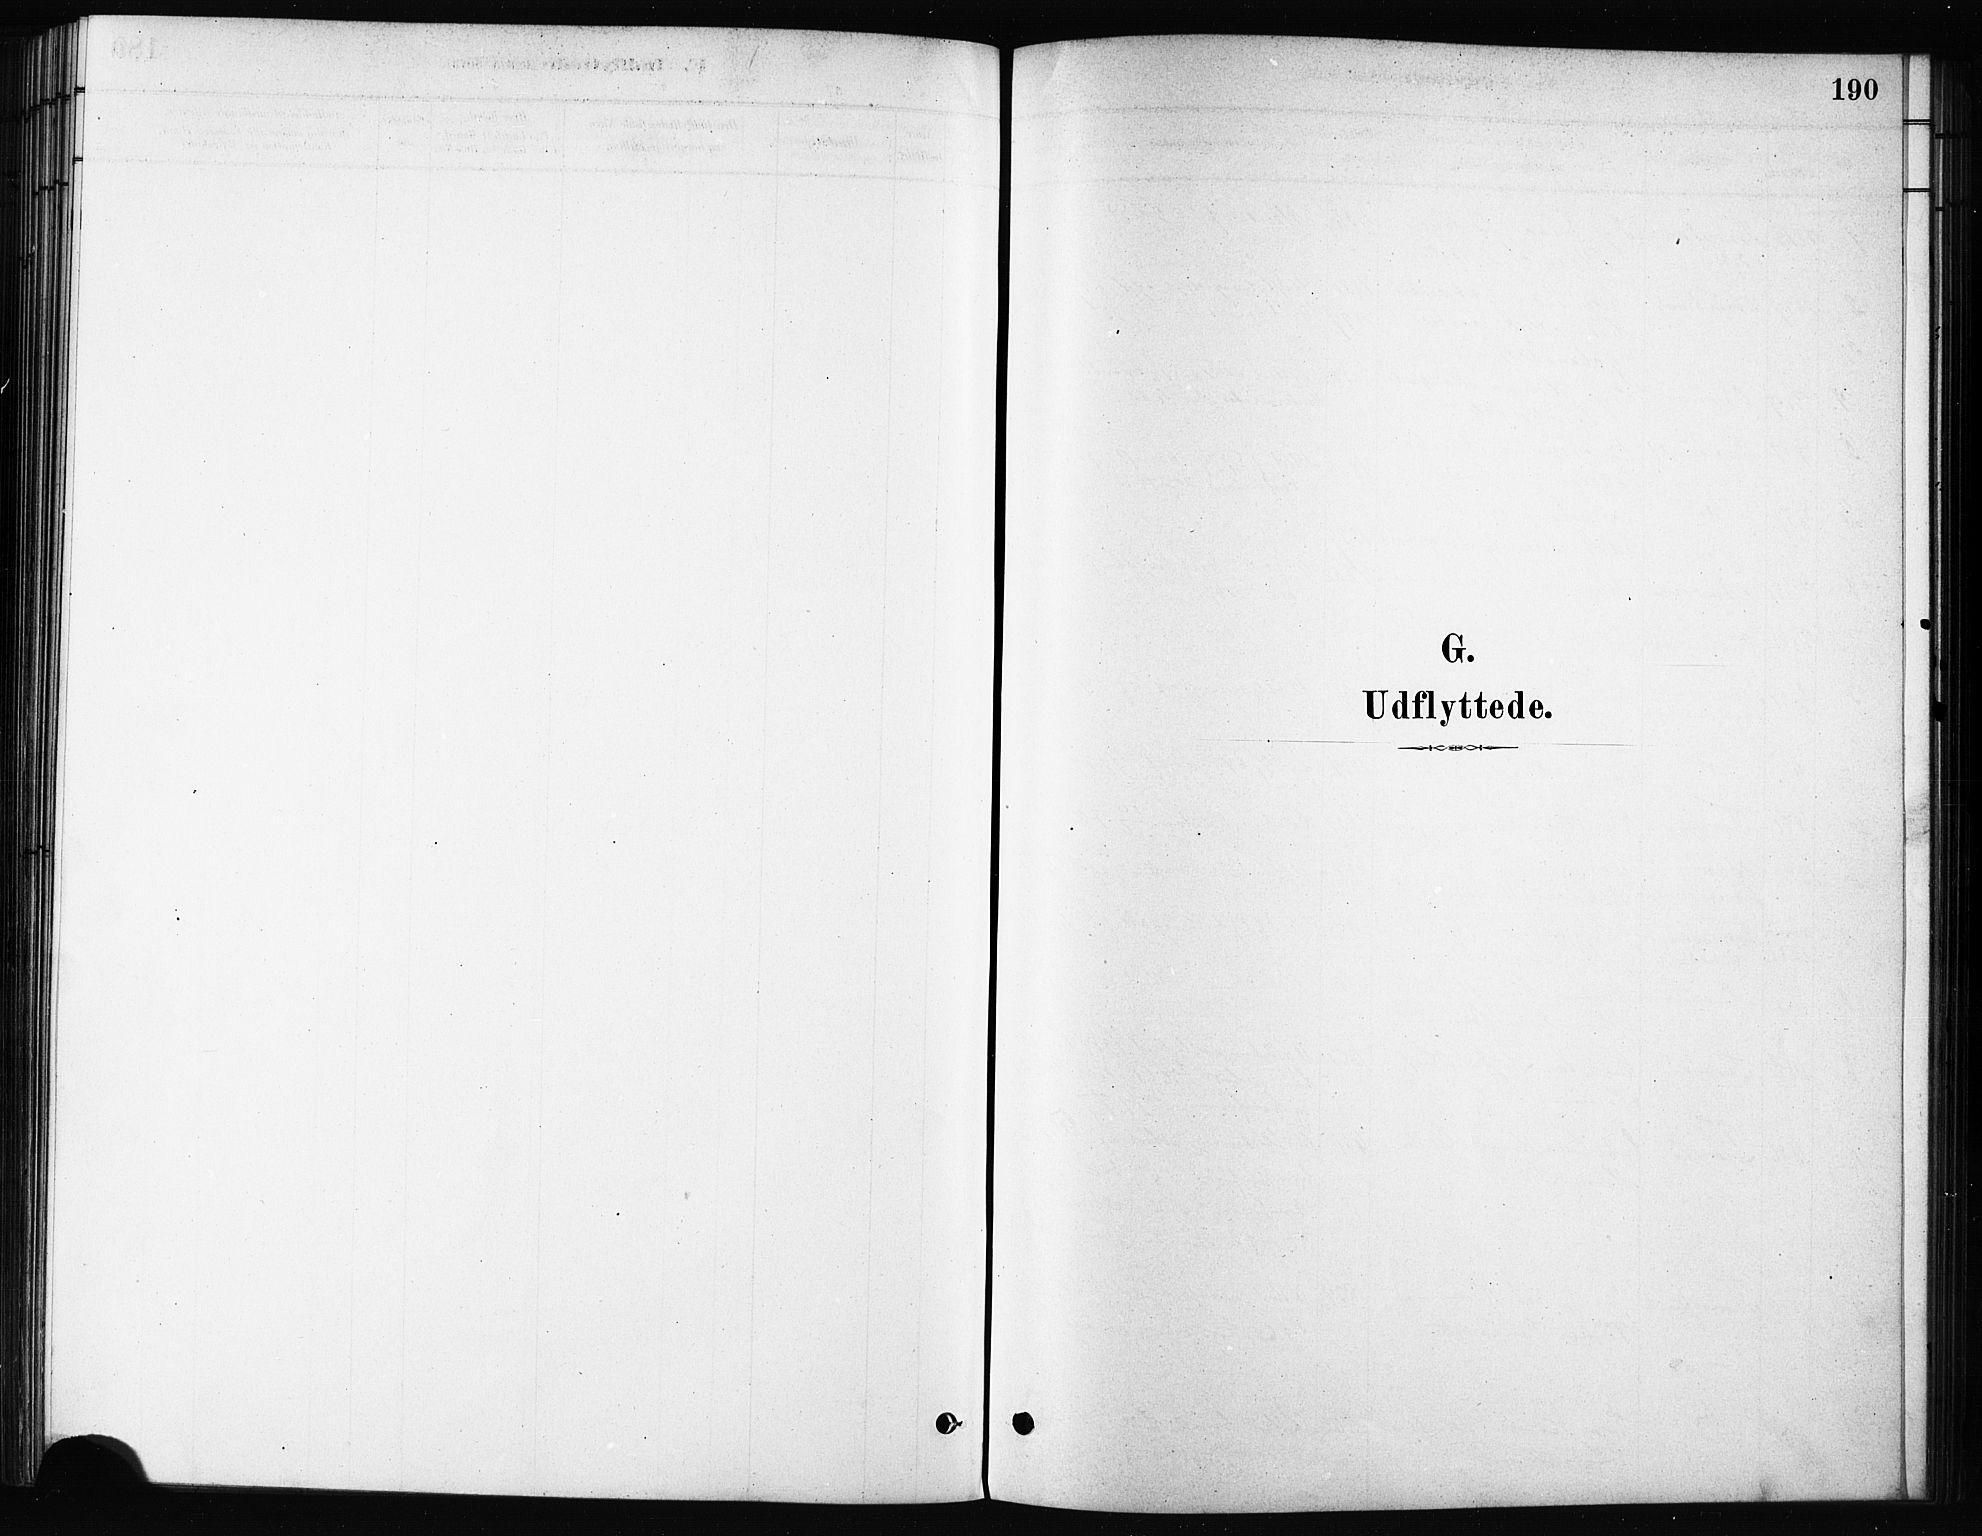 SATØ, Karlsøy sokneprestembete, H/Ha/Haa/L0011kirke: Ministerialbok nr. 11, 1879-1892, s. 190